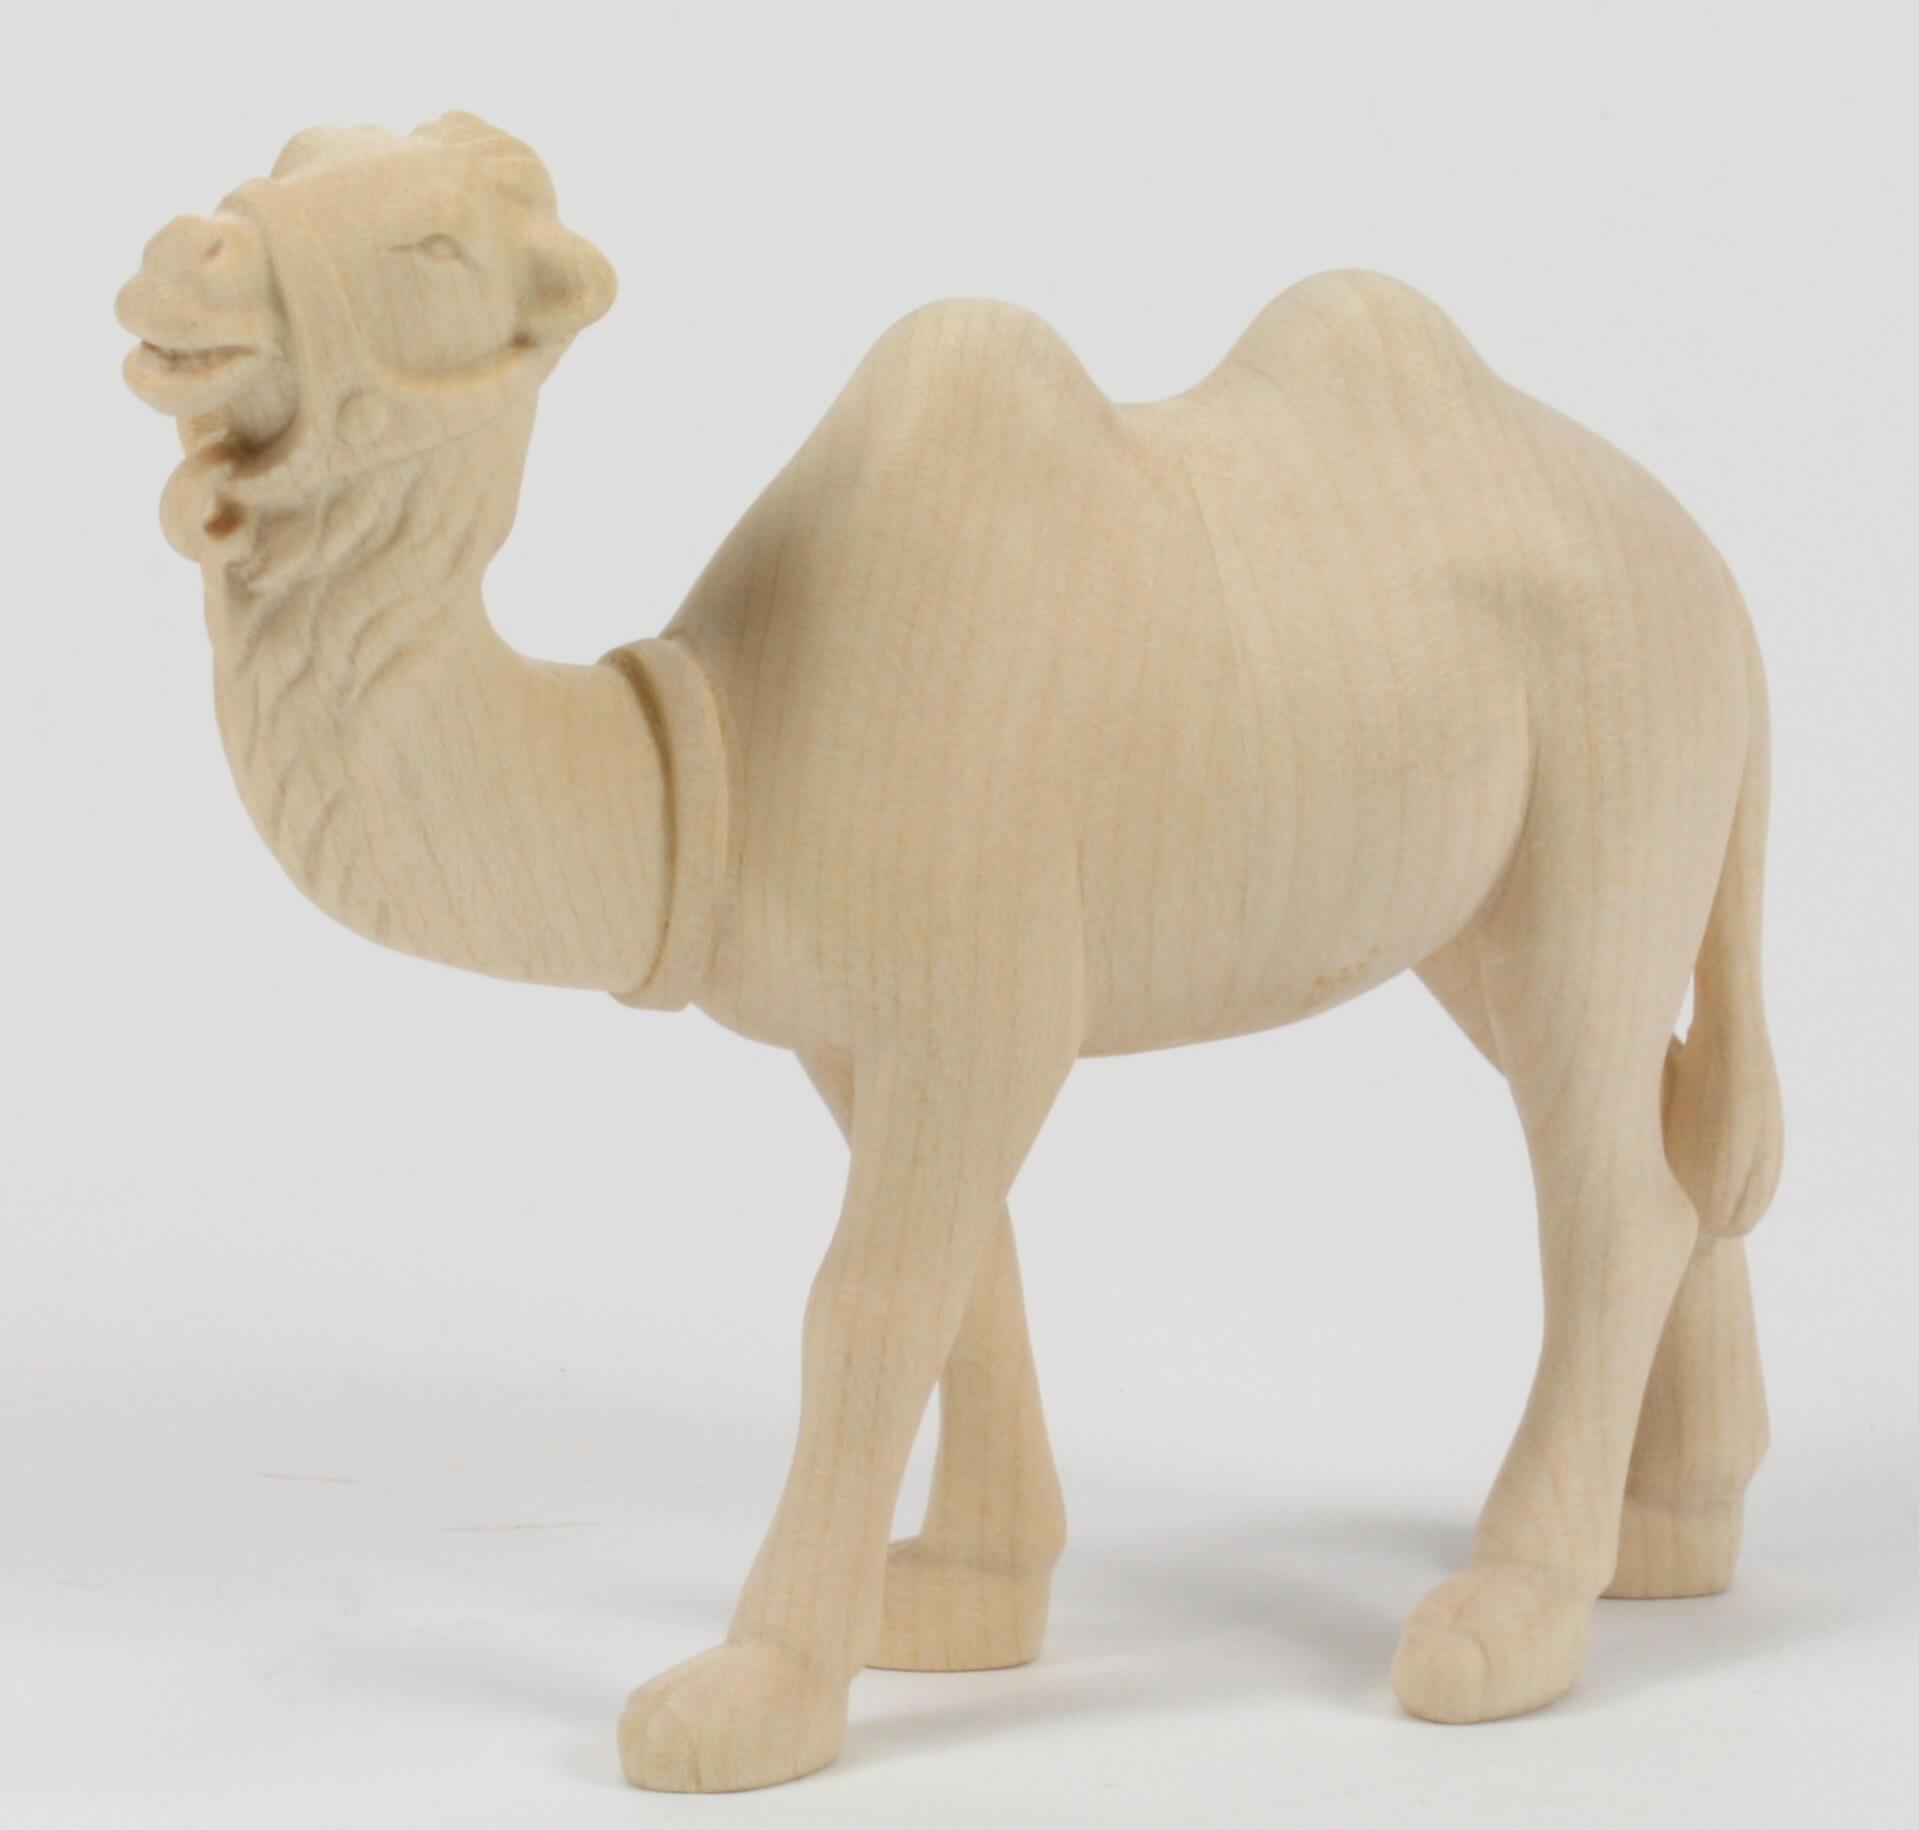 Georg krippe kamel stehend modern 9 cm serie natur - Krippe modern holz ...